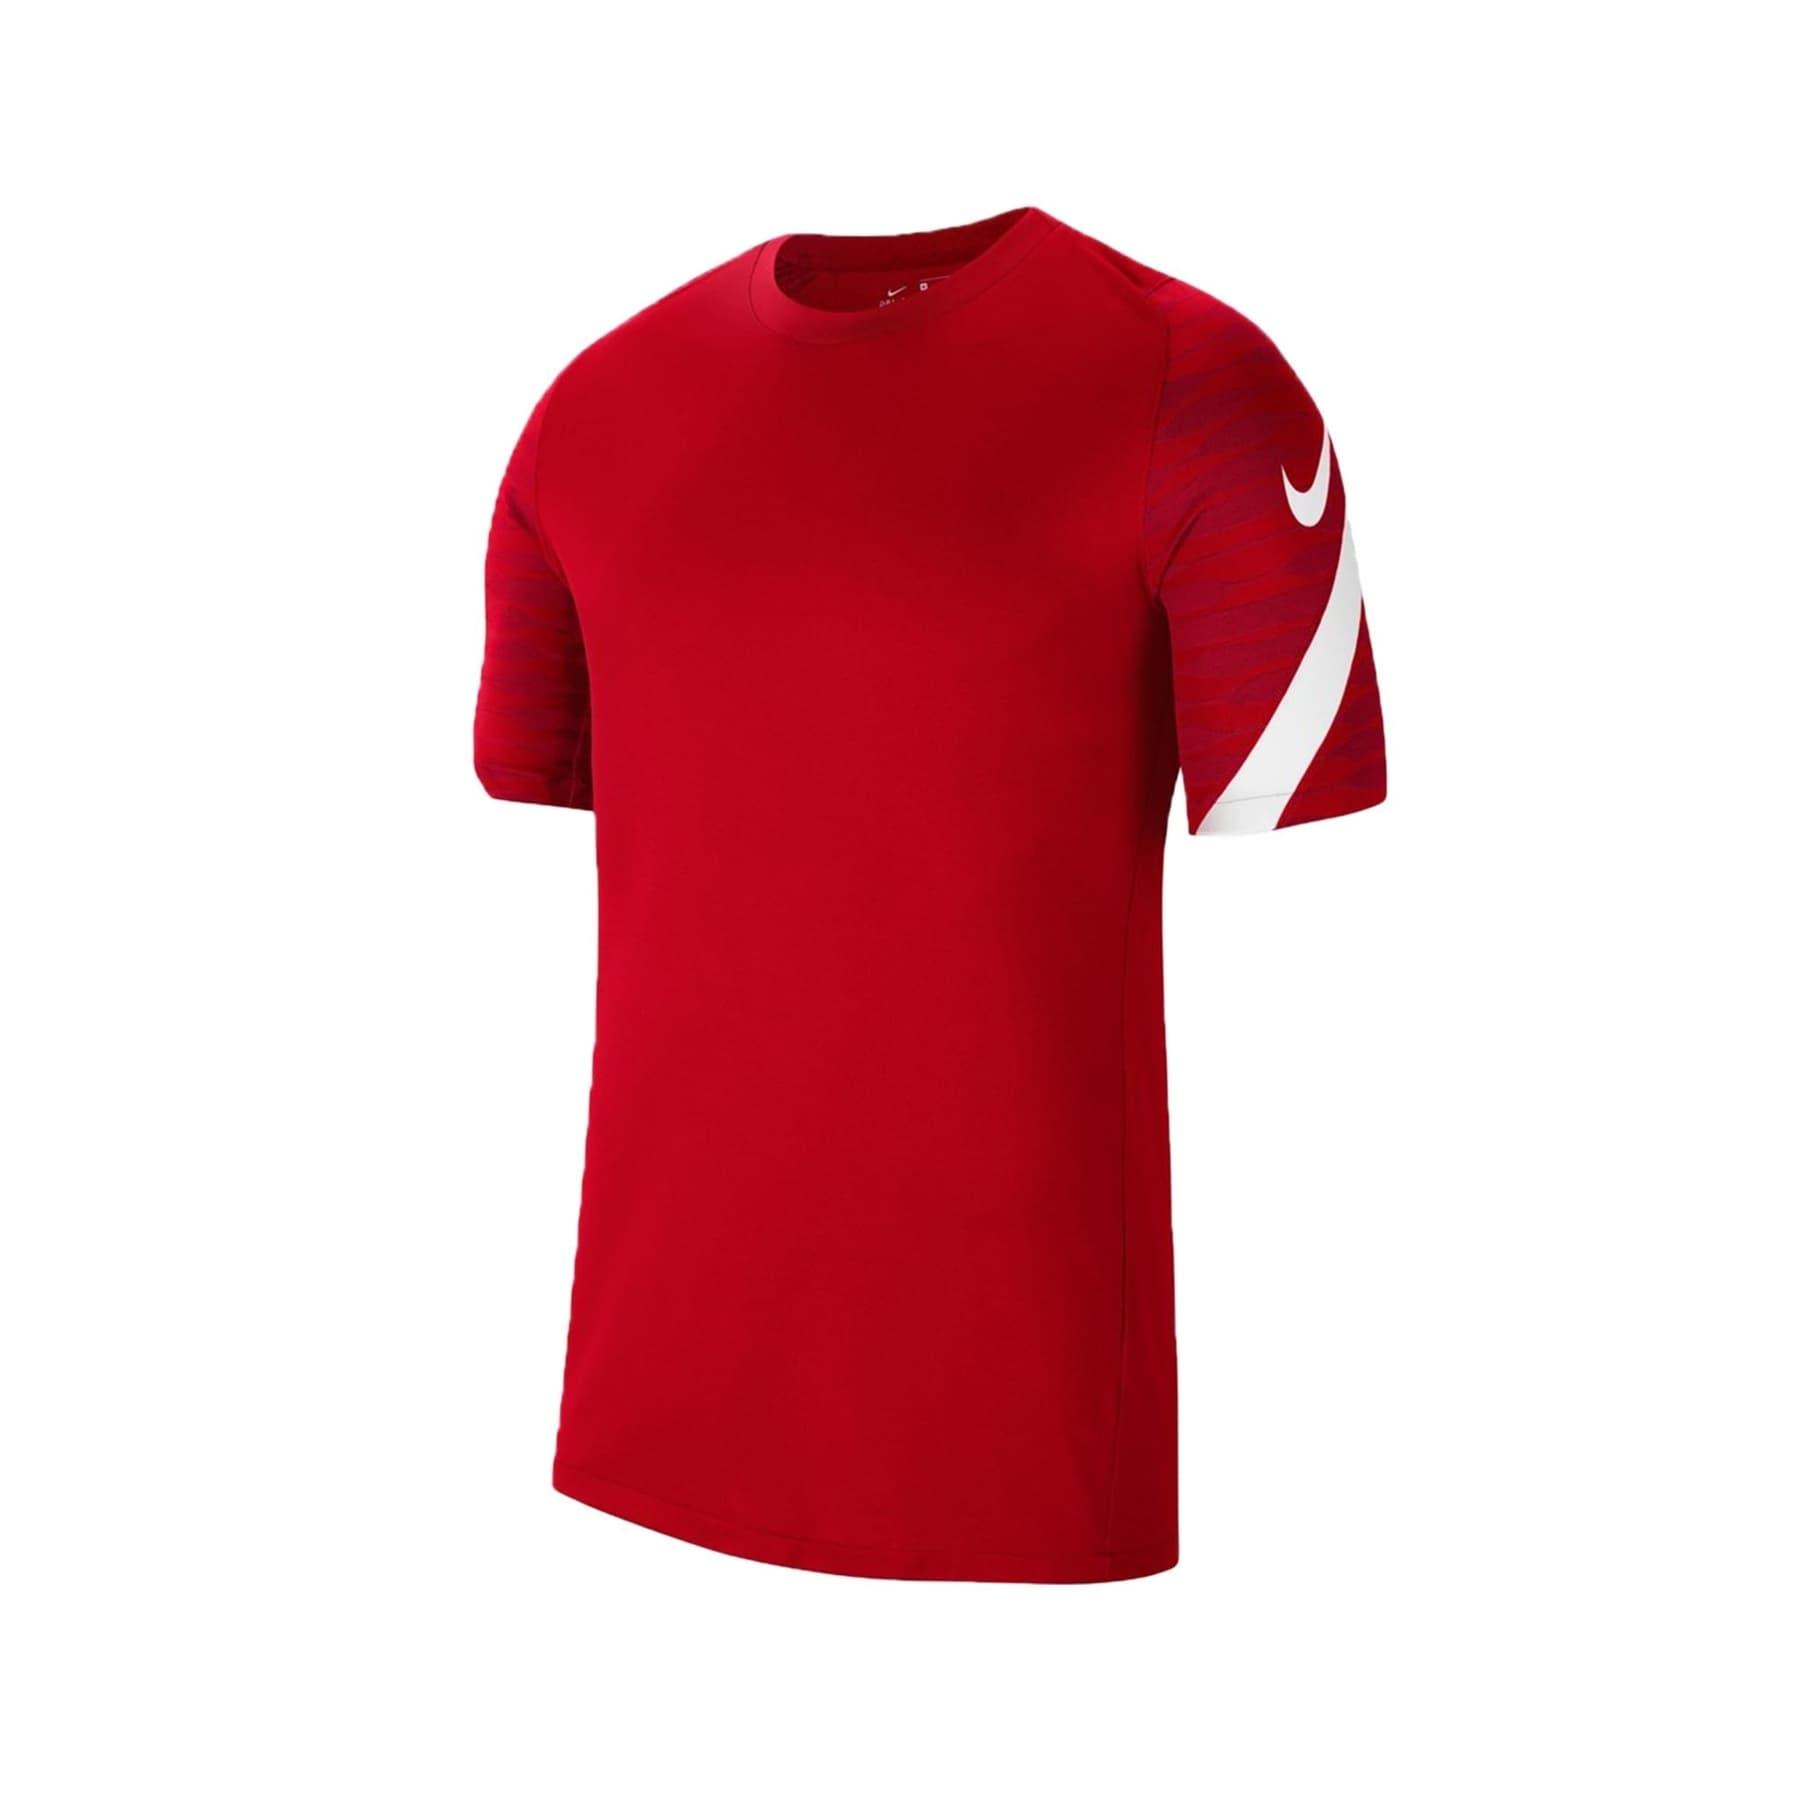 Dri-Fit Strike 21 Erkek Kırmızı Spor Tişört (CW5843-657)